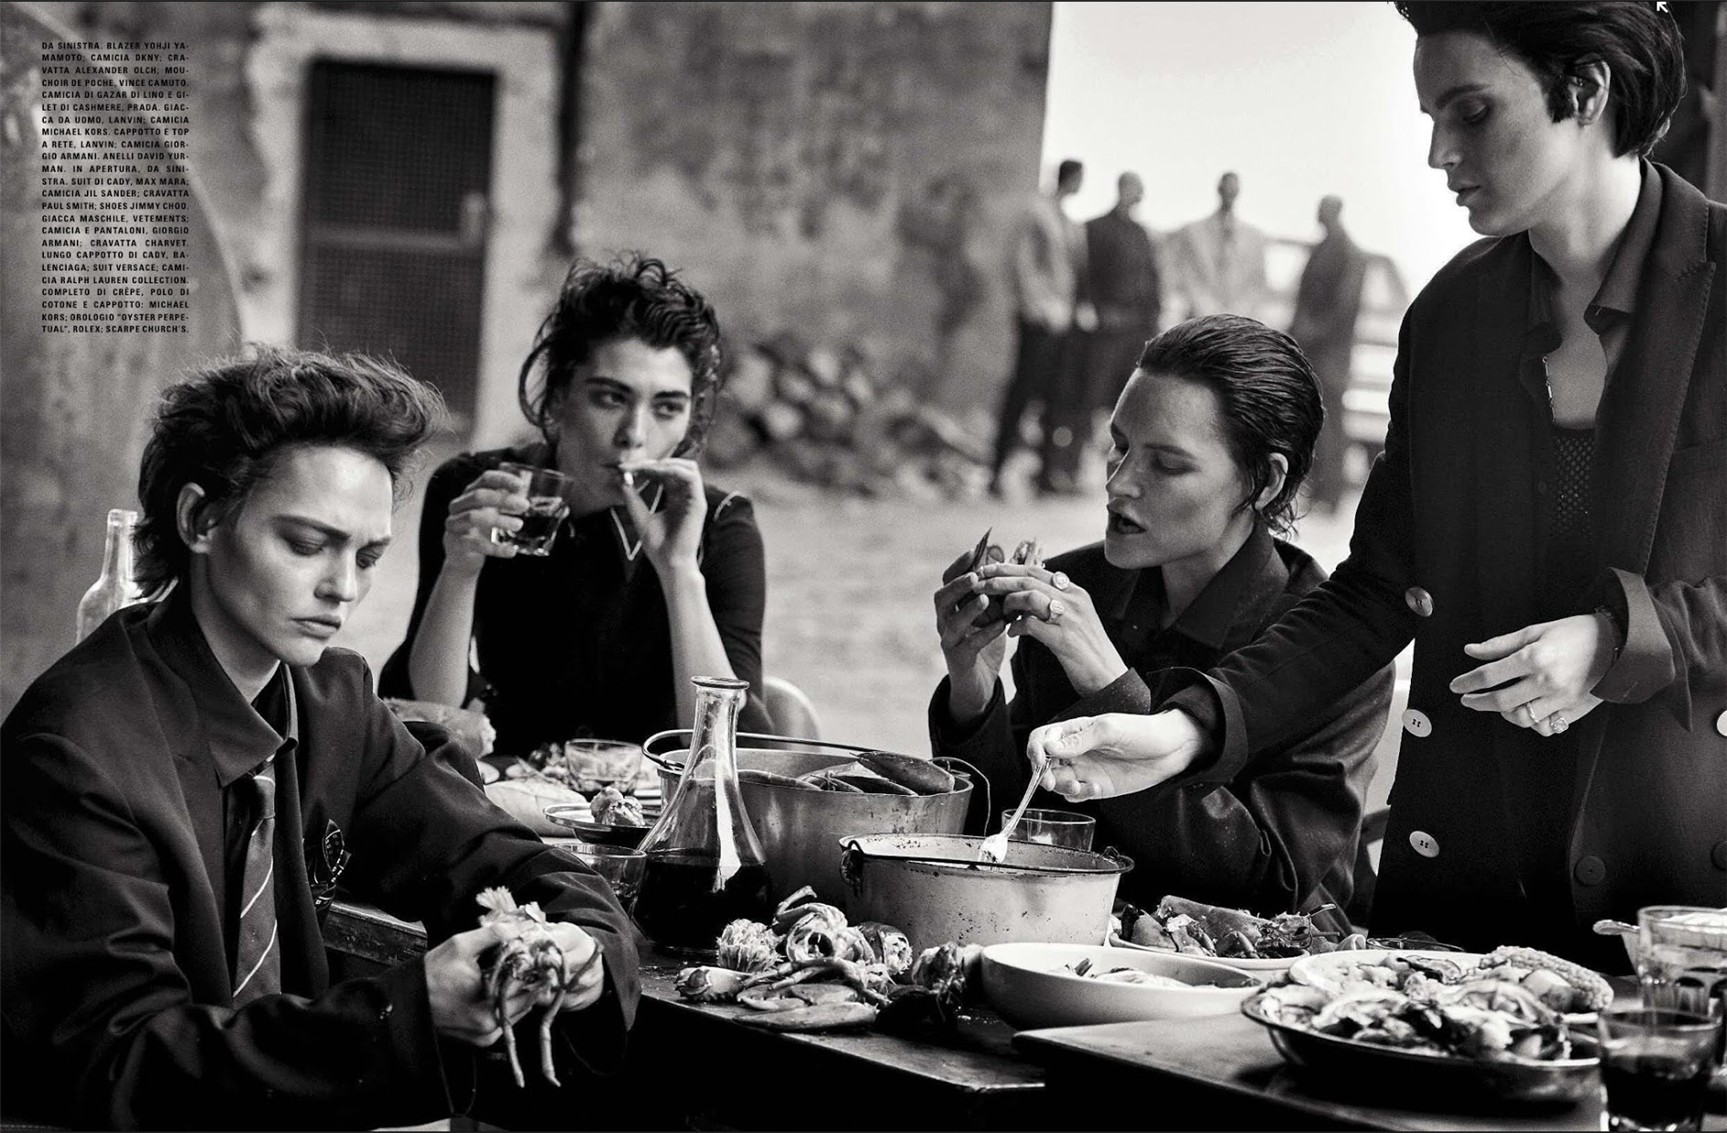 Sasha Pivovarova, Guinevere Van Seenus, Steffy Argelich, Kirsten Owen / Lunch in Brooklyn by Peter Lindbergh in Vogue Italia may 2015